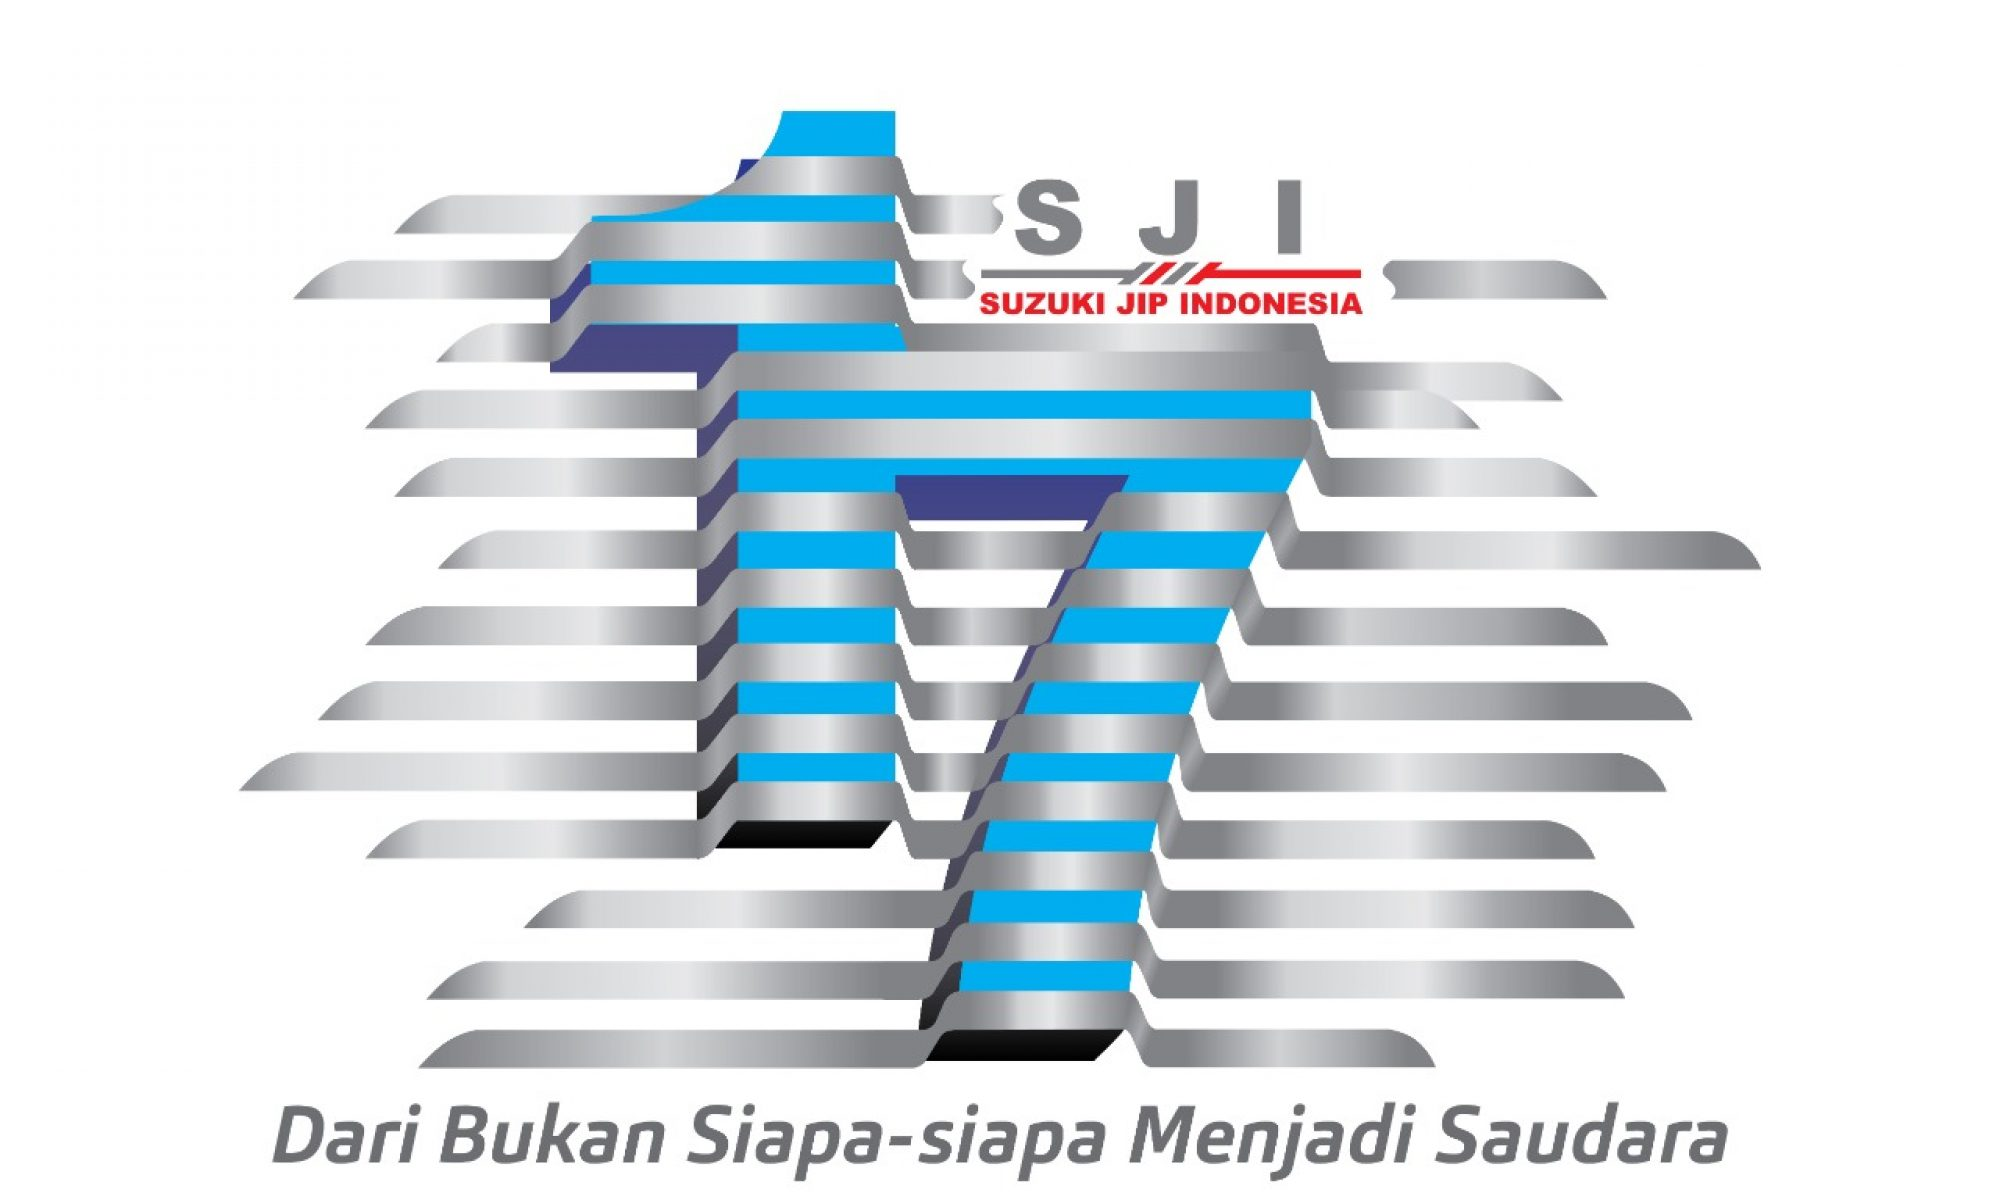 Suzuki JIP Indonesia